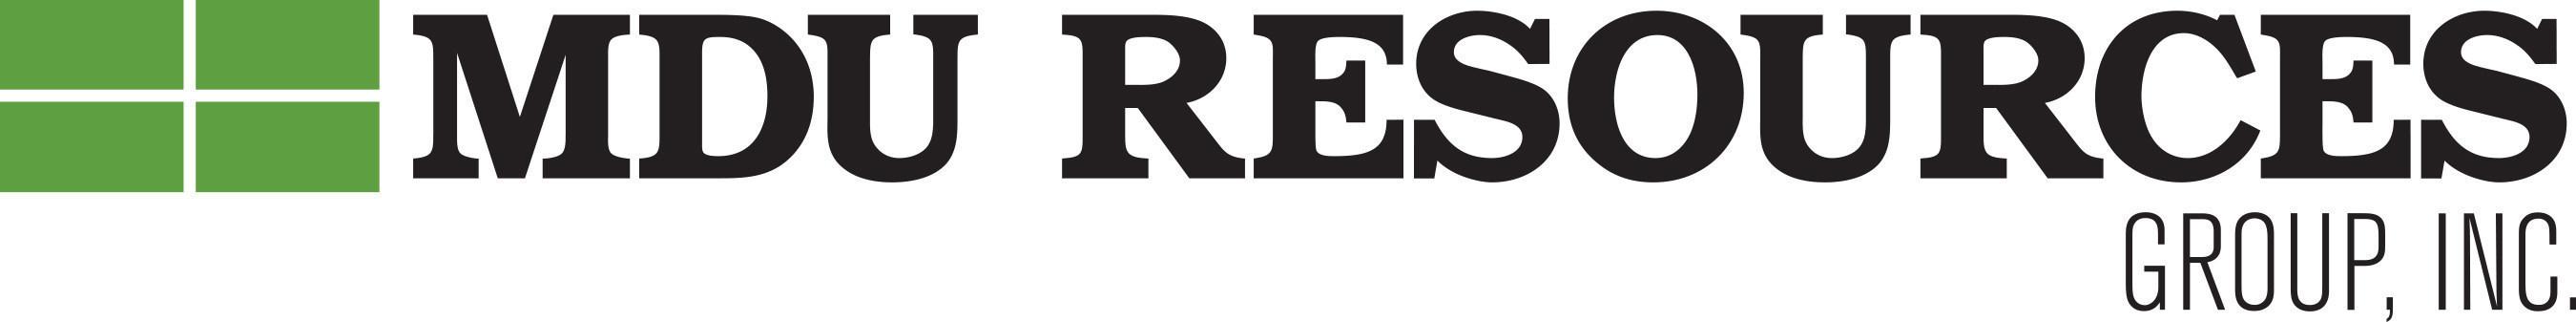 MDU Resources logo